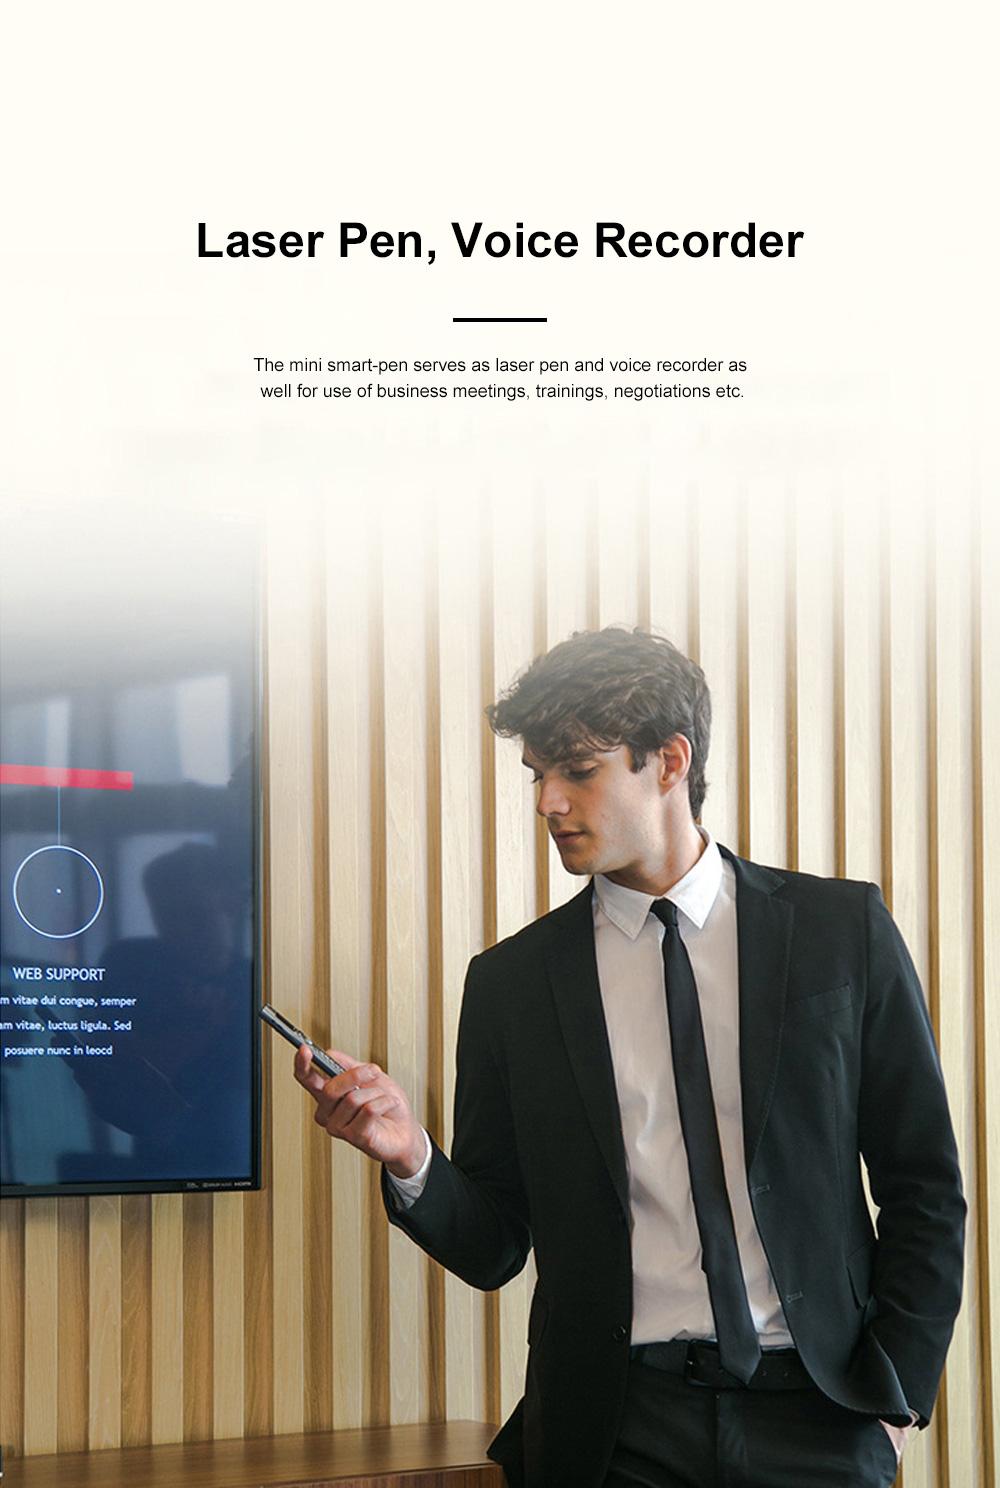 Mini Recording Smart-pen for Multifunctional Portable Exquisite Pen-like Smartphone Laser Pointer Digital Voice Recorder Backup Device 3